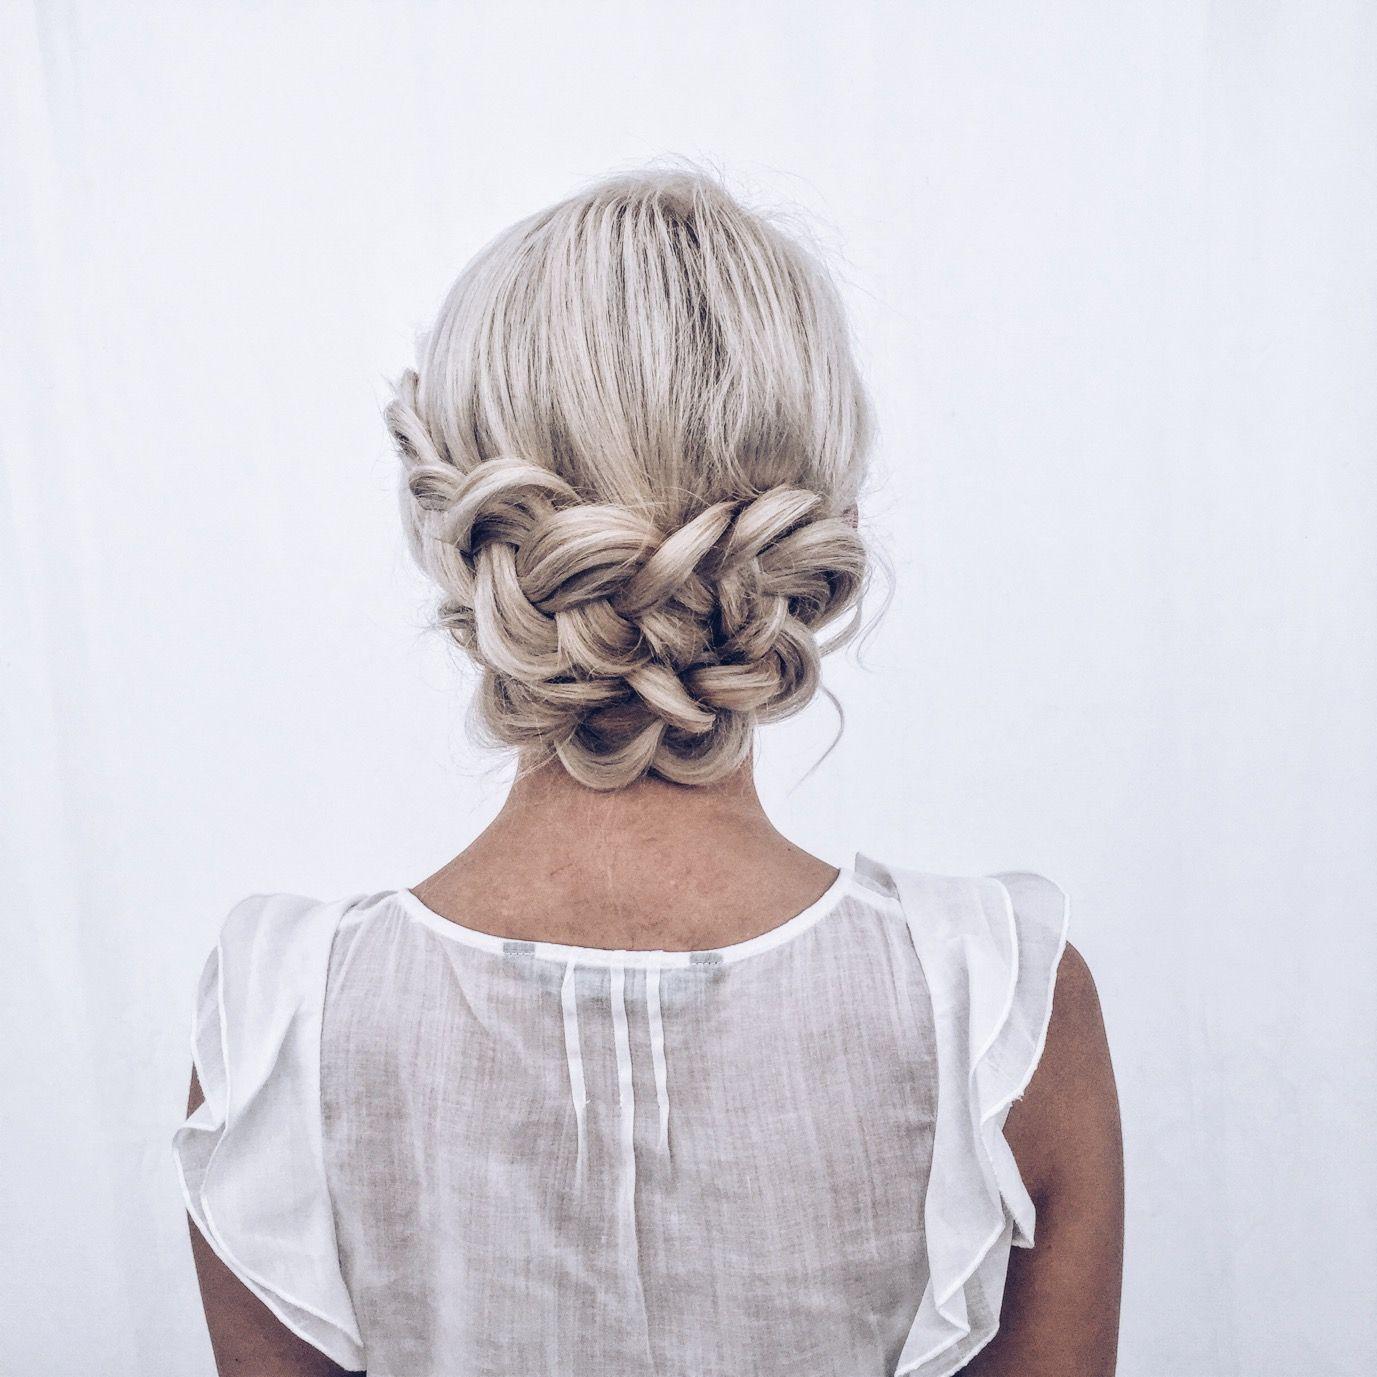 Hair style : coiffure , tresses , blonde, blond, hair, girl, braid ...